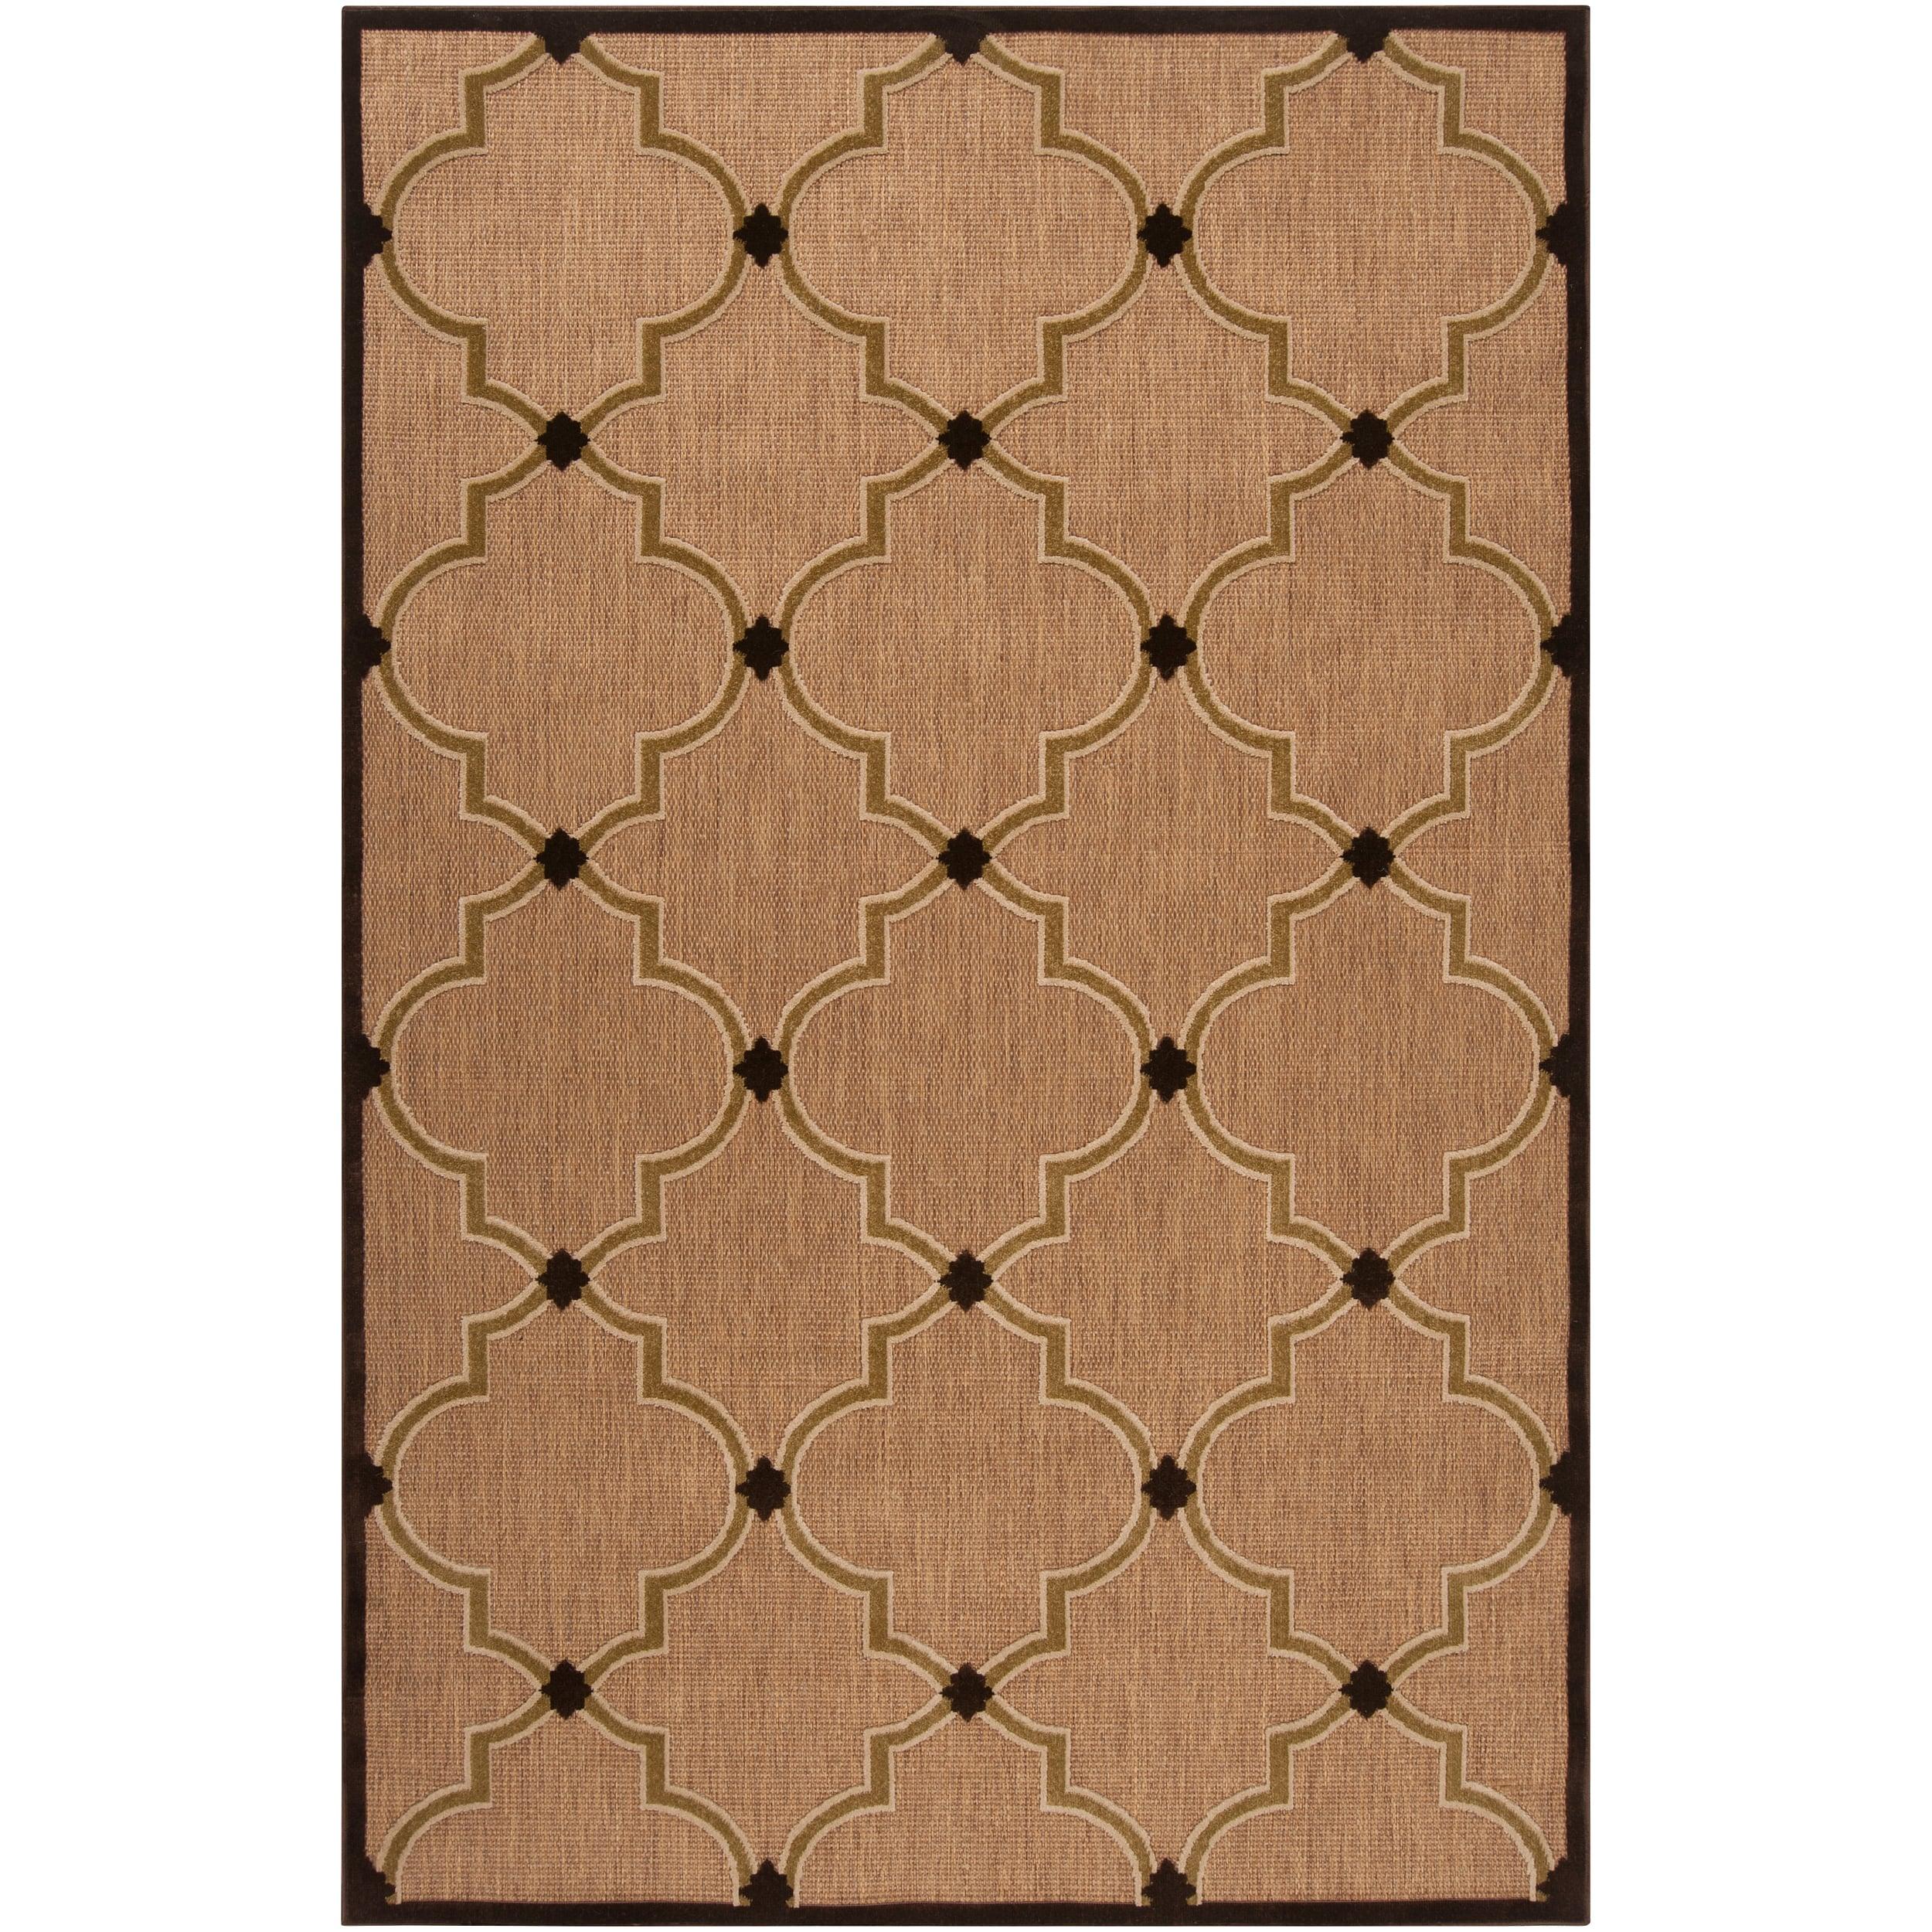 Woven Tan Tewa Indoor/Outdoor Moroccan Lattice Area Rug (8'8 x 12')